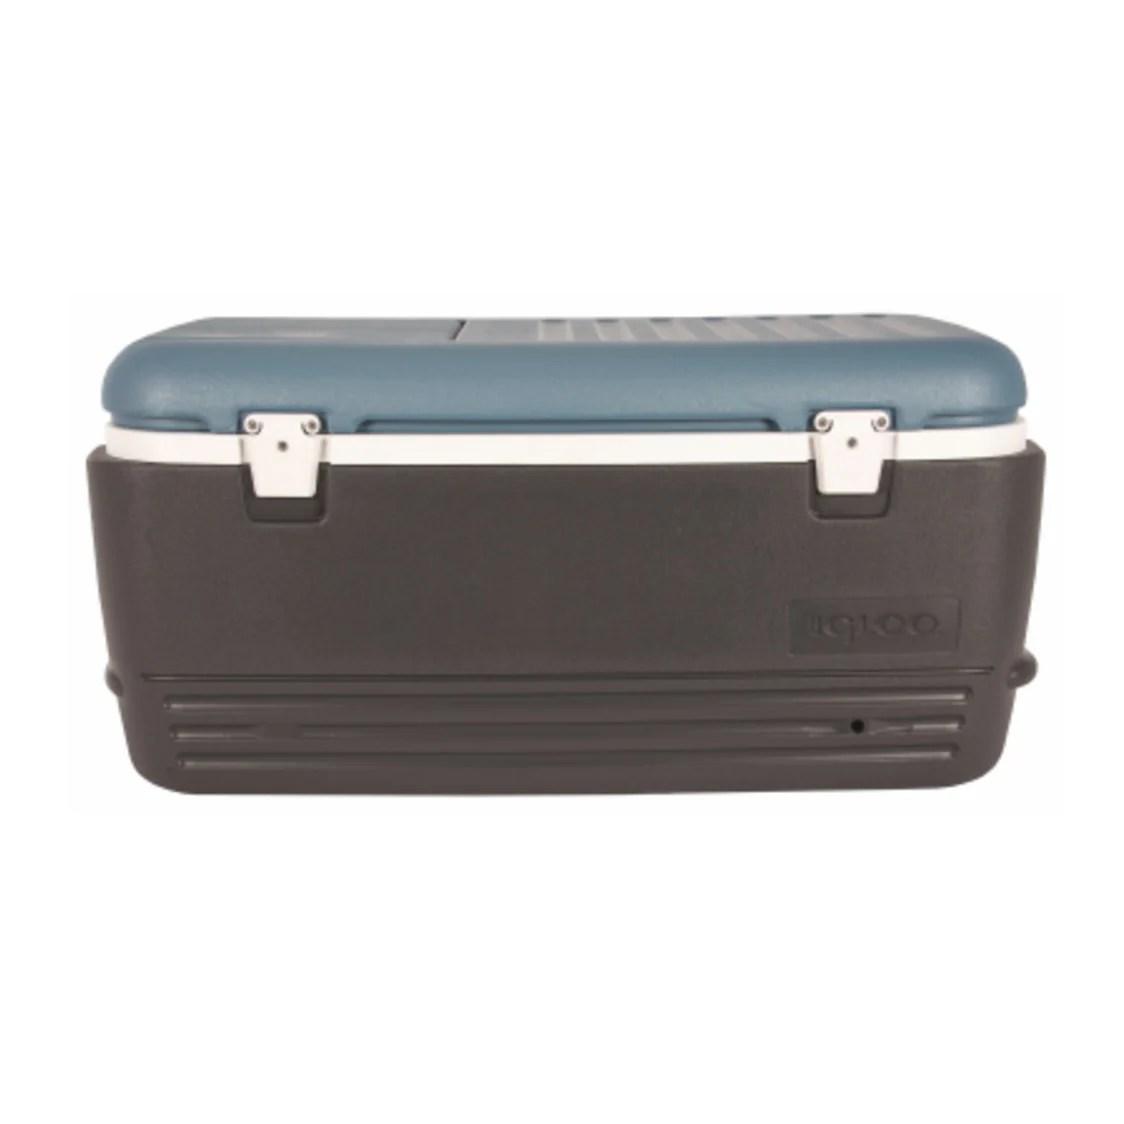 Igloo 49496 Maxcold Cooler 100 Quart Capacity